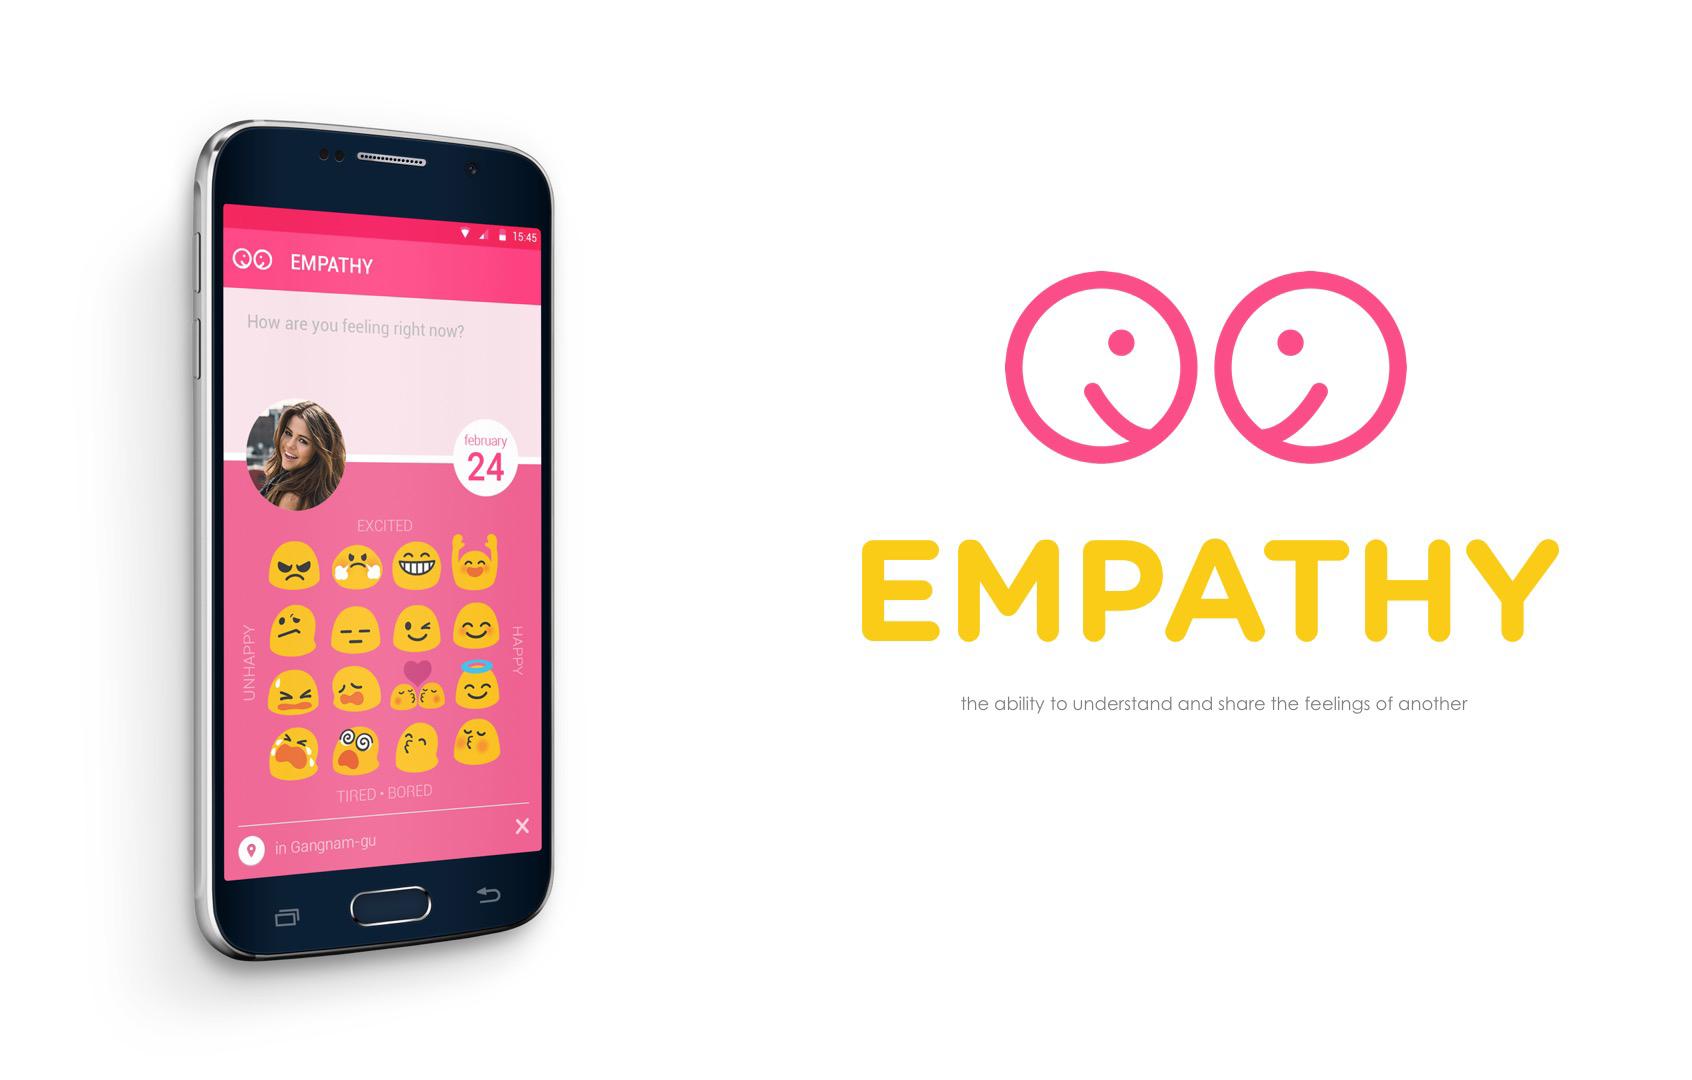 empathy_intro.jpg